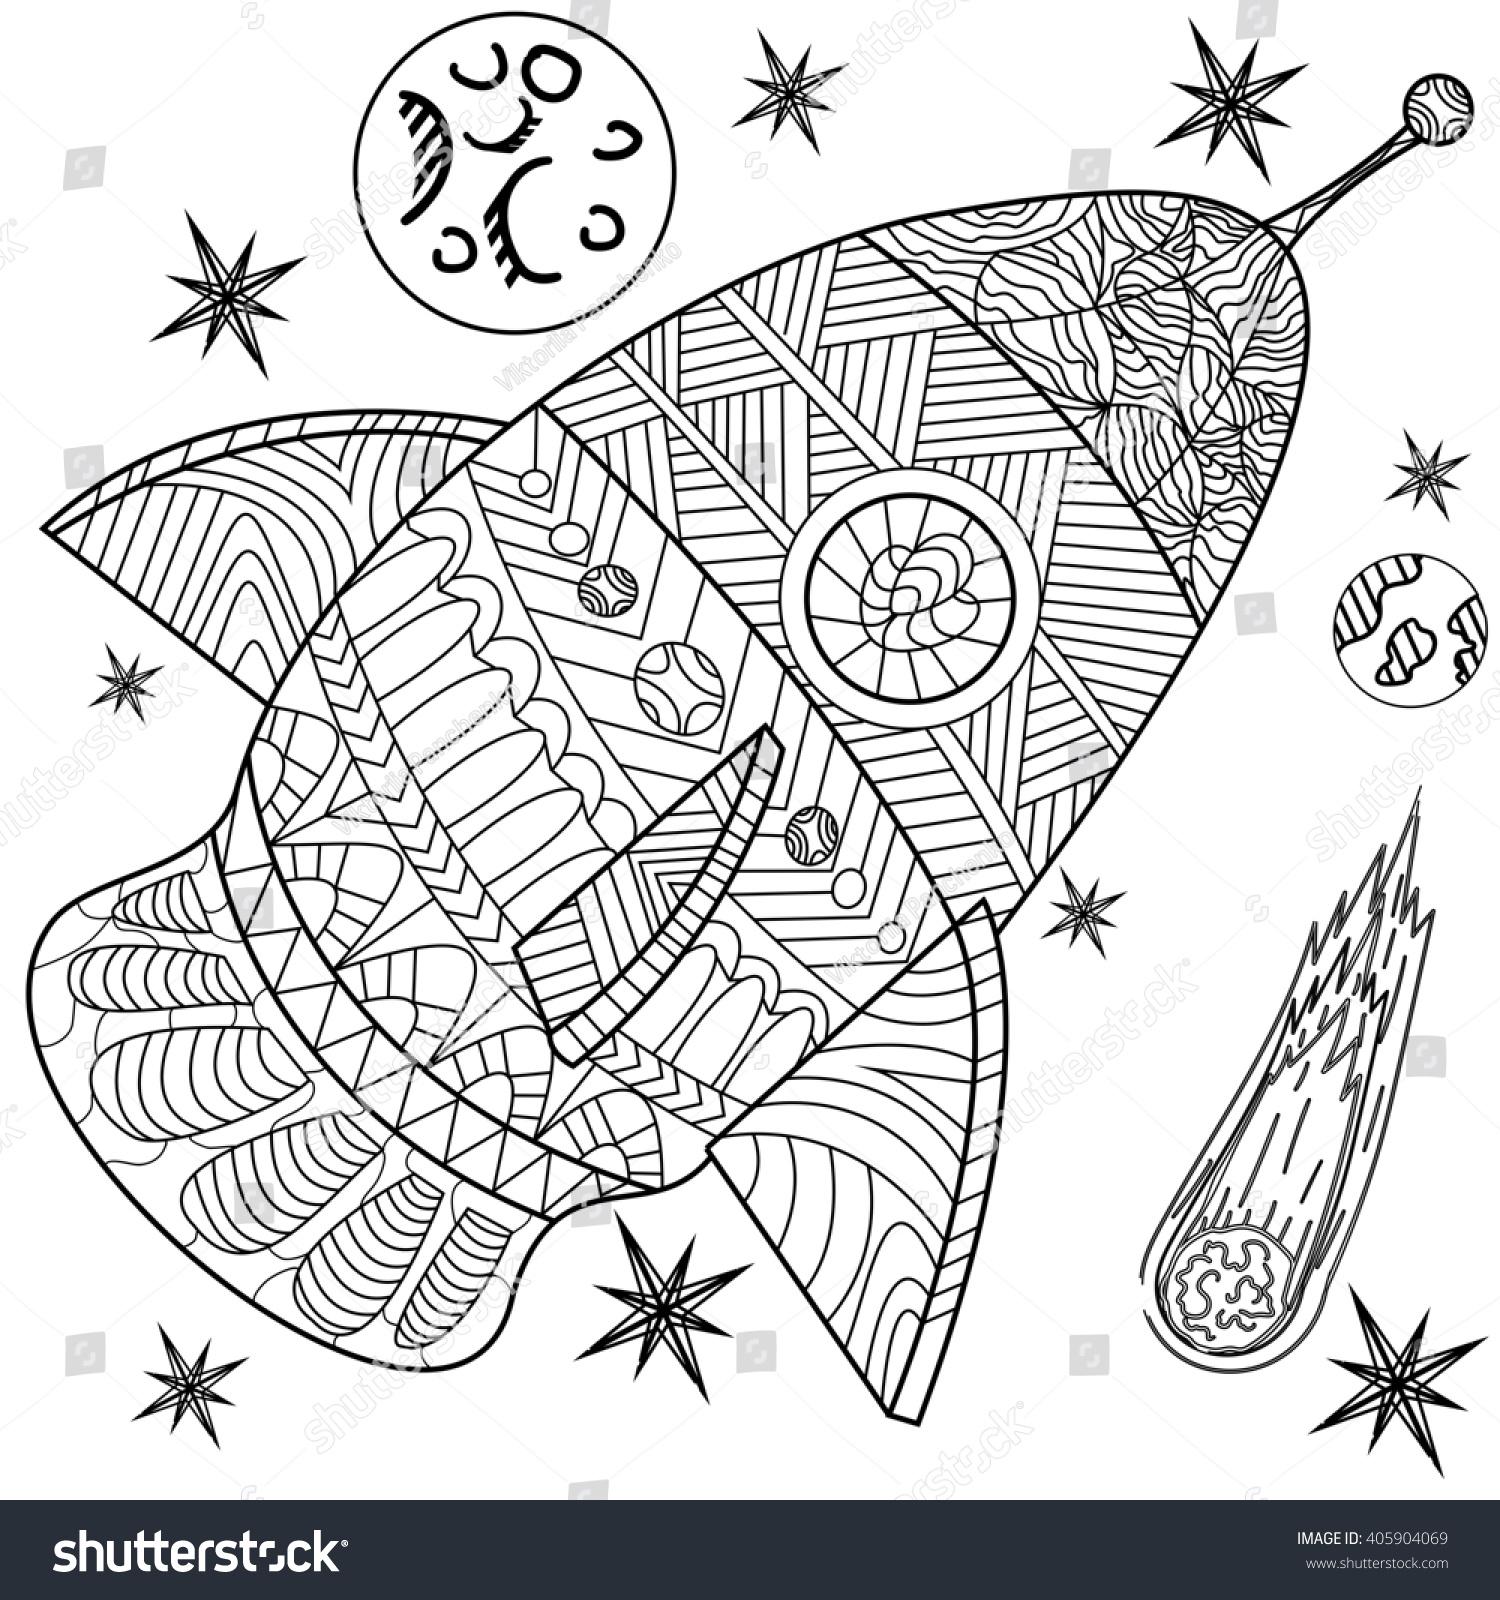 Space Coloring Book Line Art Design Stock Illustration 405904069 ...